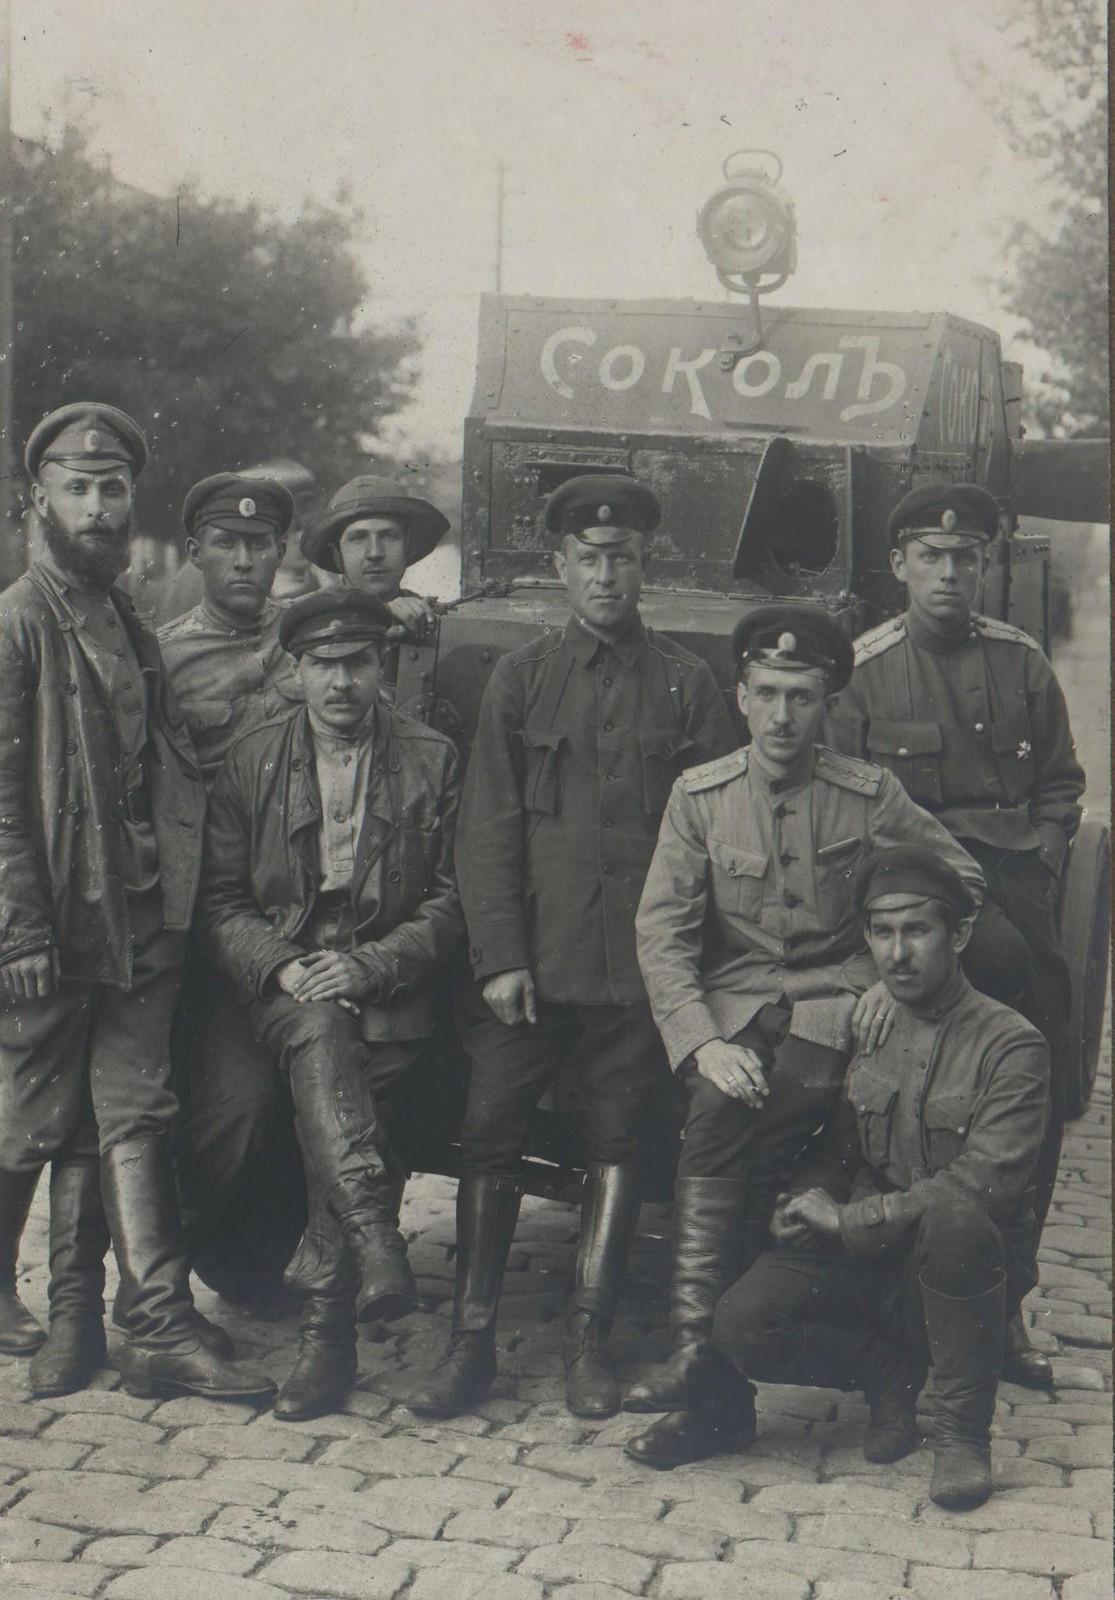 60. 1918. Броневик «Соколъ»